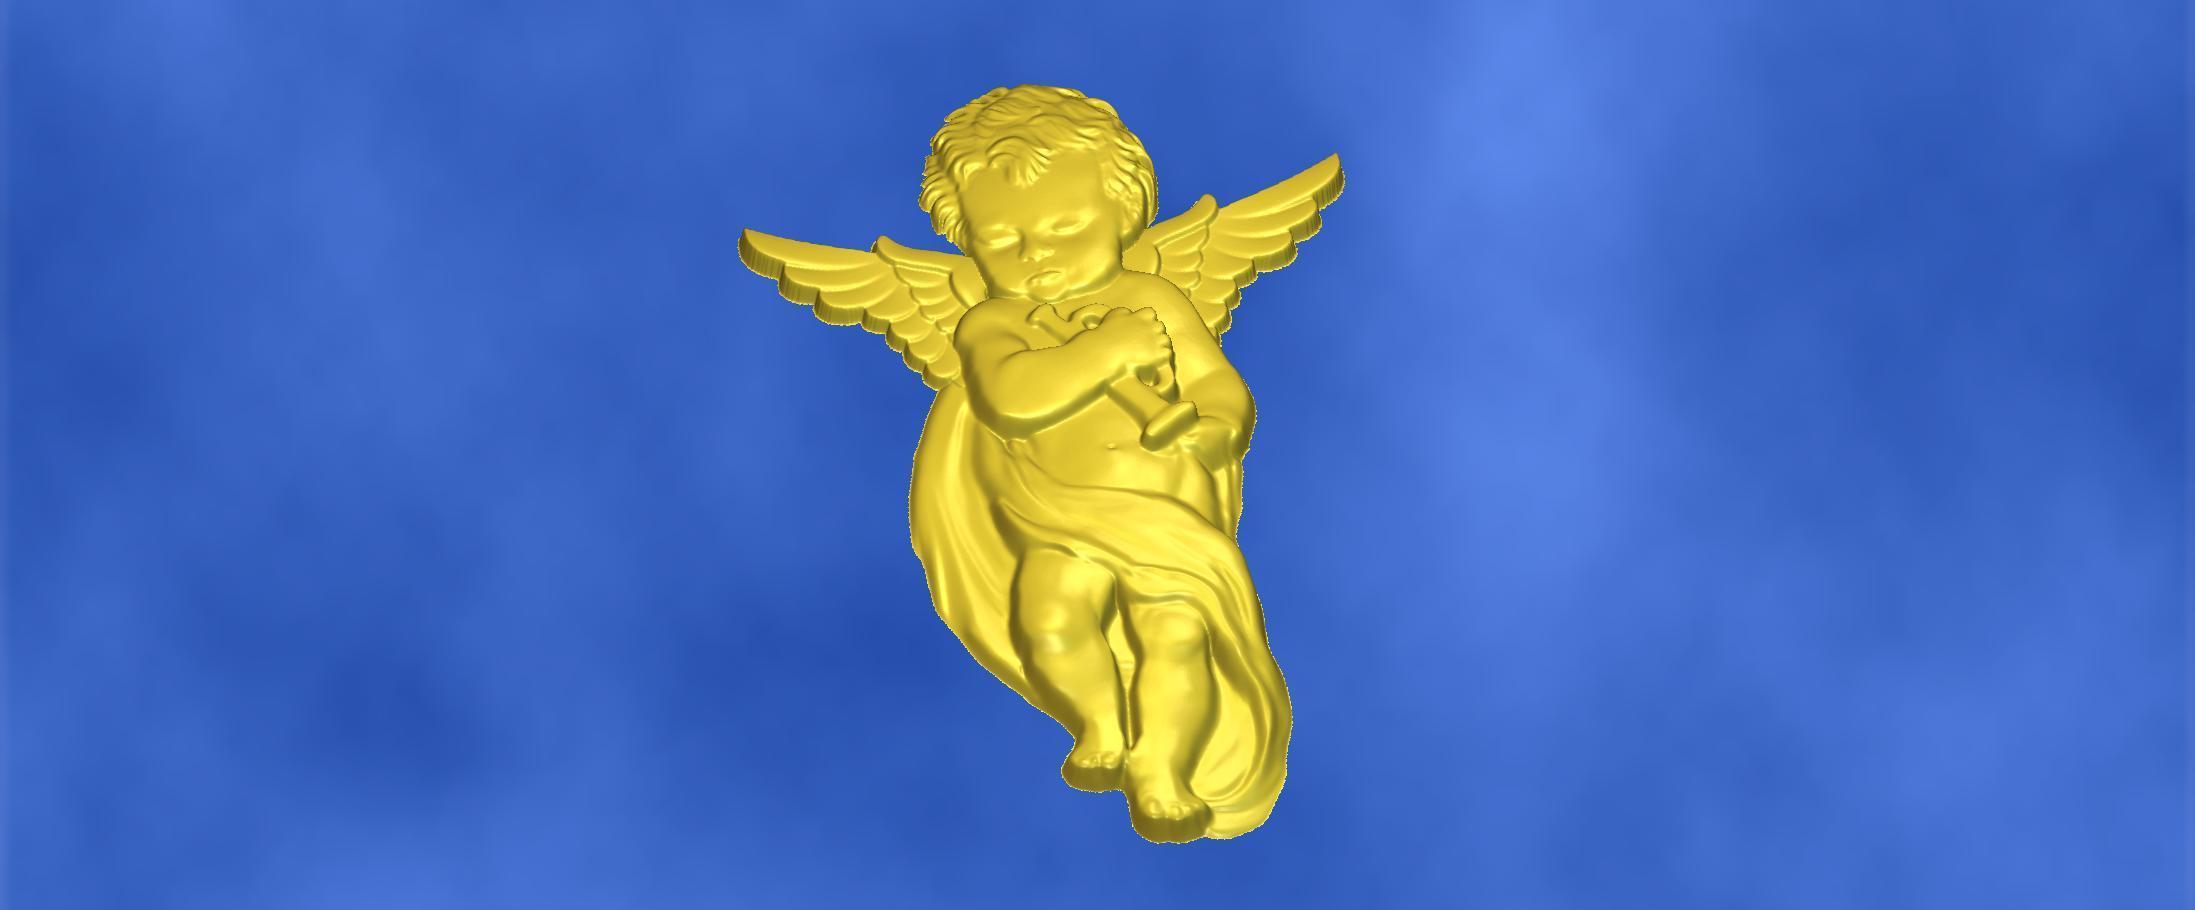 13.jpg Download free STL file 3D STL MODEL CHERUB  • 3D print model, ALPHA_MENA